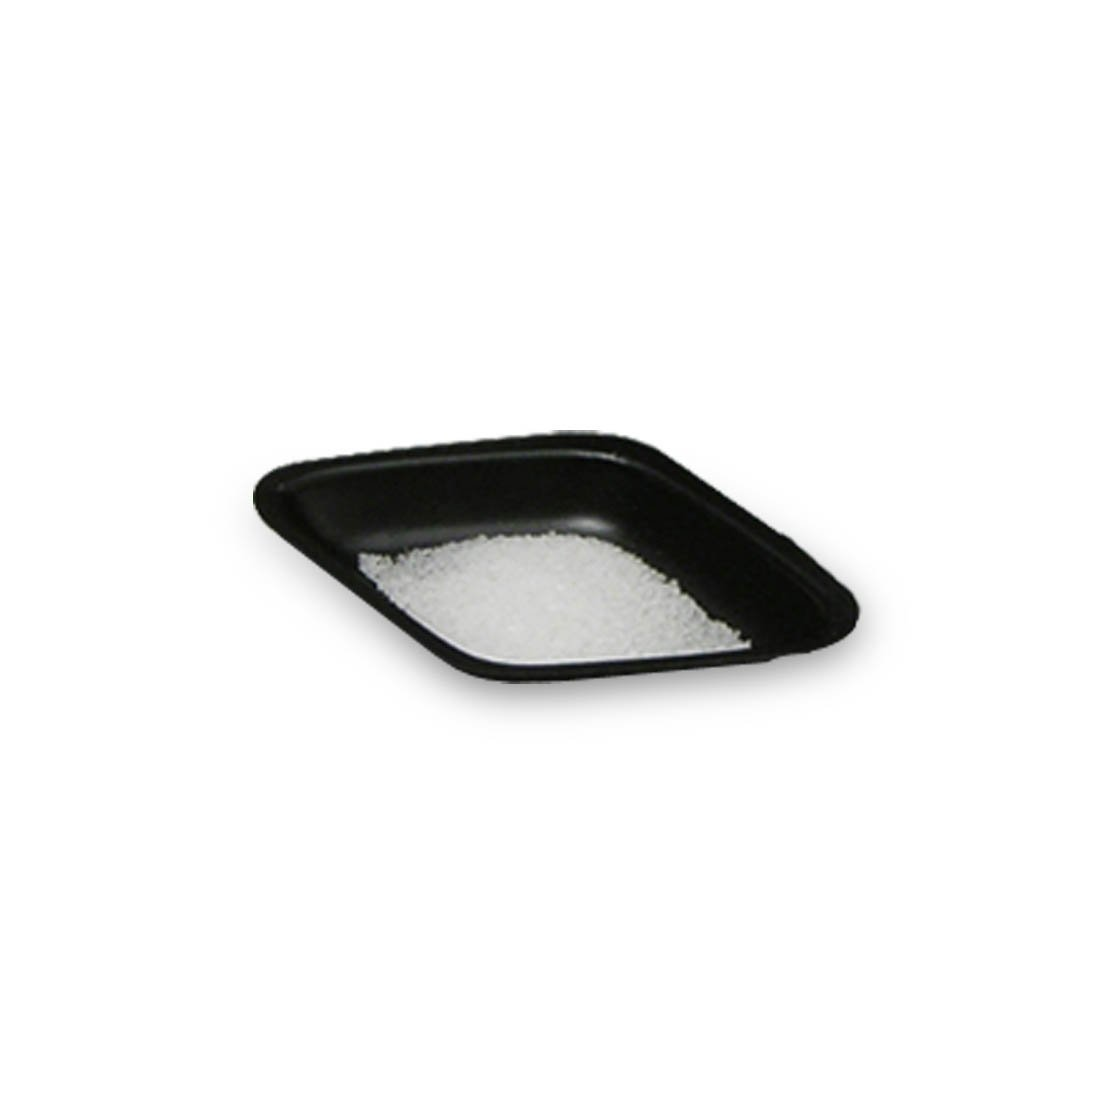 5mL Black Antistatic Polystyrene Diamond Shaped Weigh Boat (30 Packs/Case - 500/Pack)